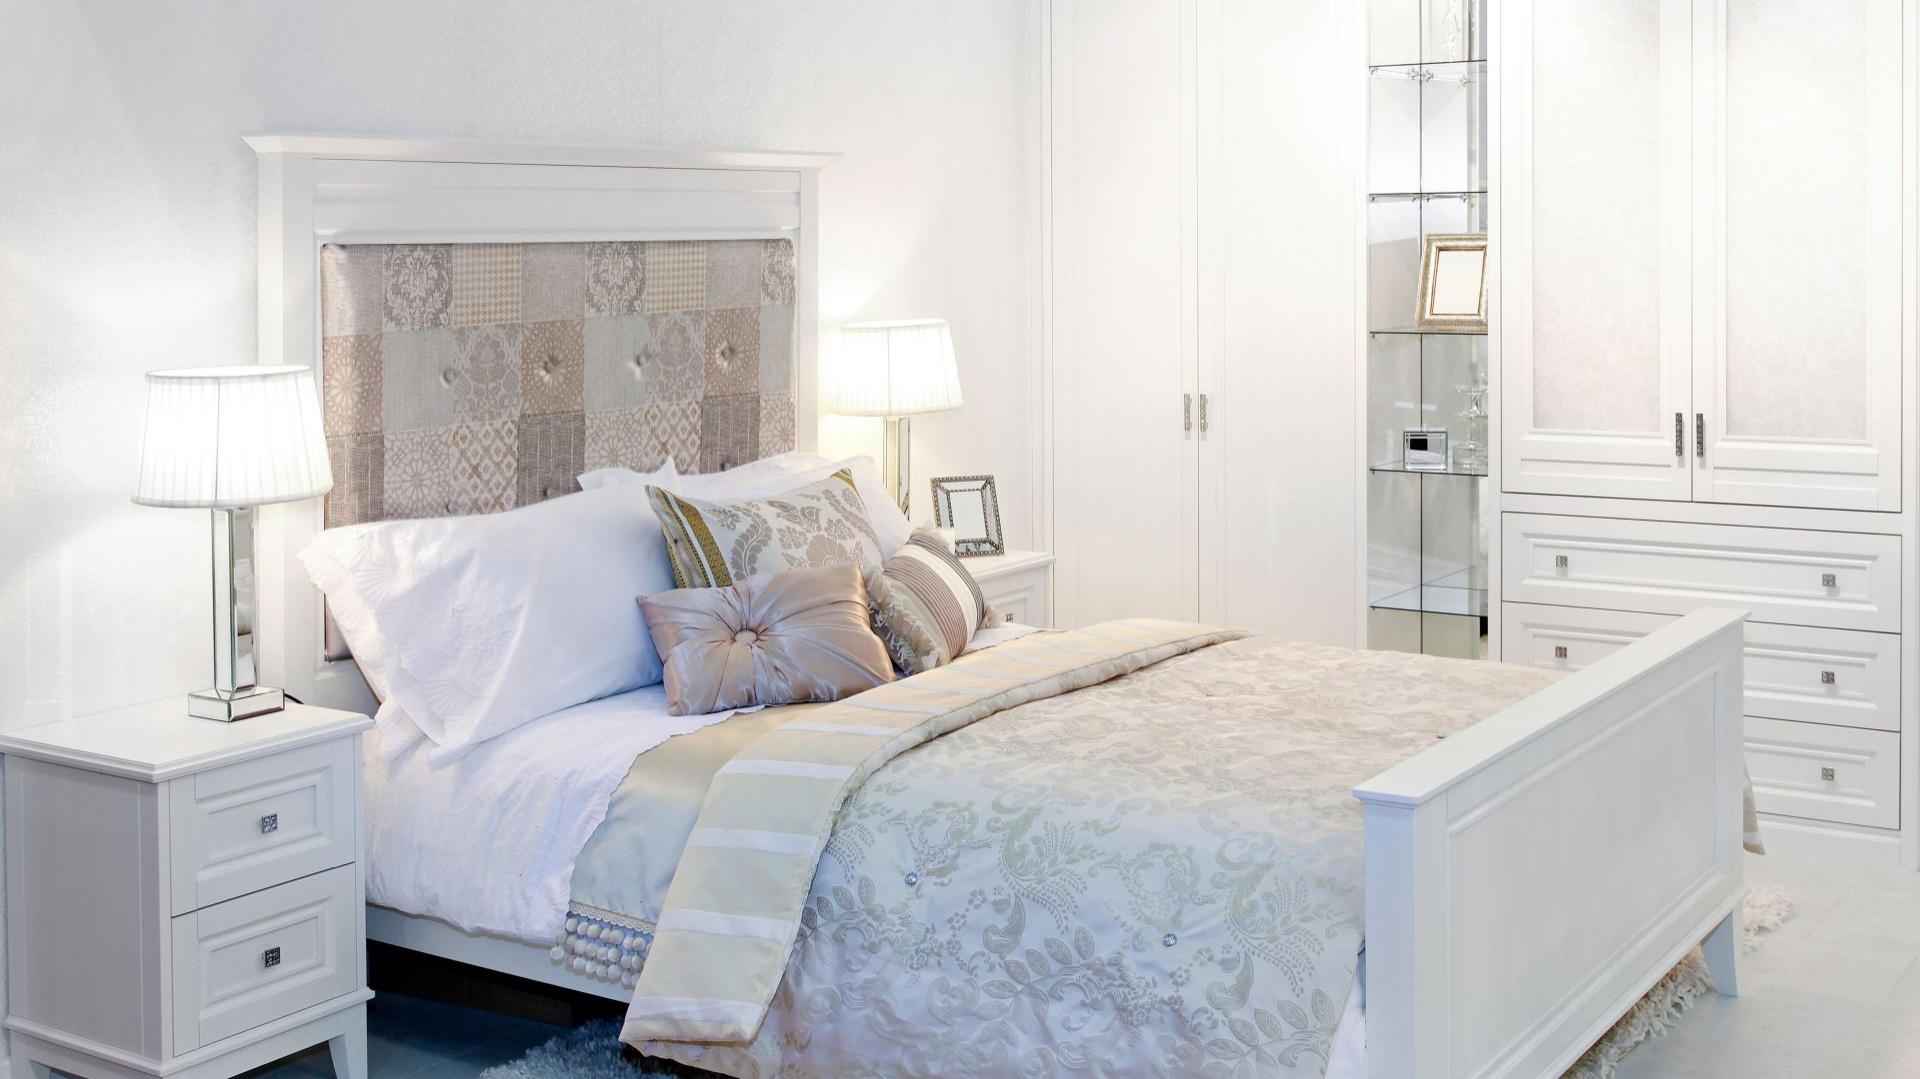 Piękna Sypialnia Modne Pomysły Na ścianę Za łóżkiem